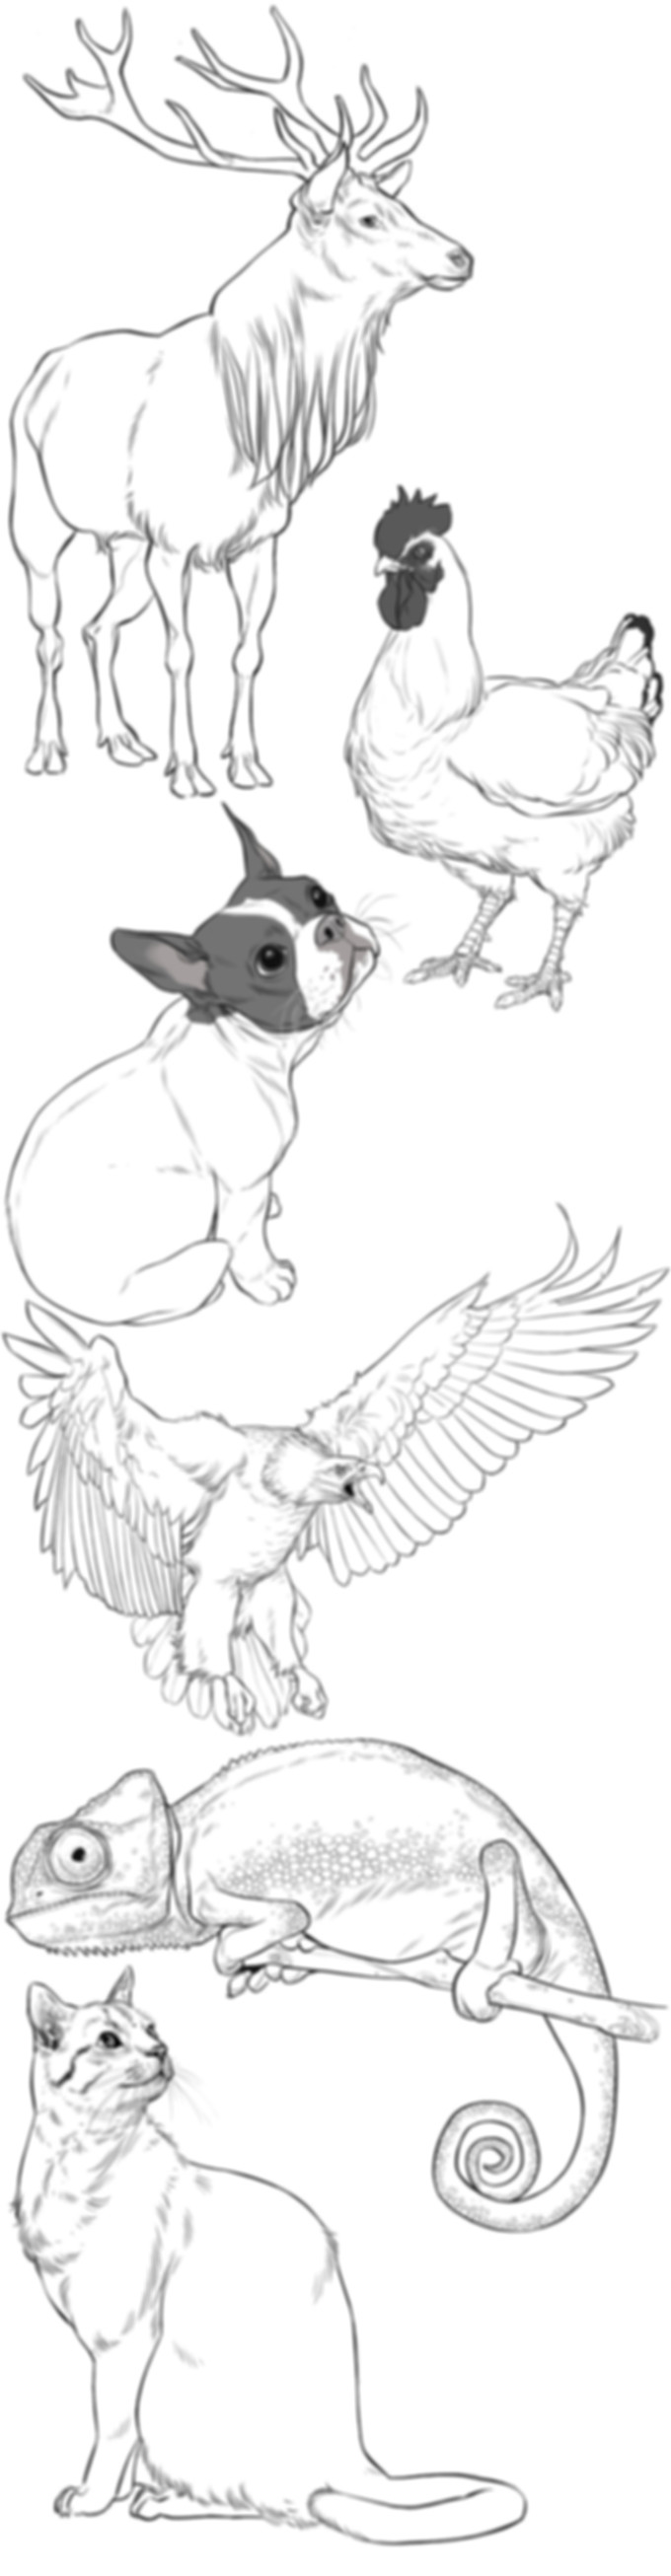 realistic-animals.jpg